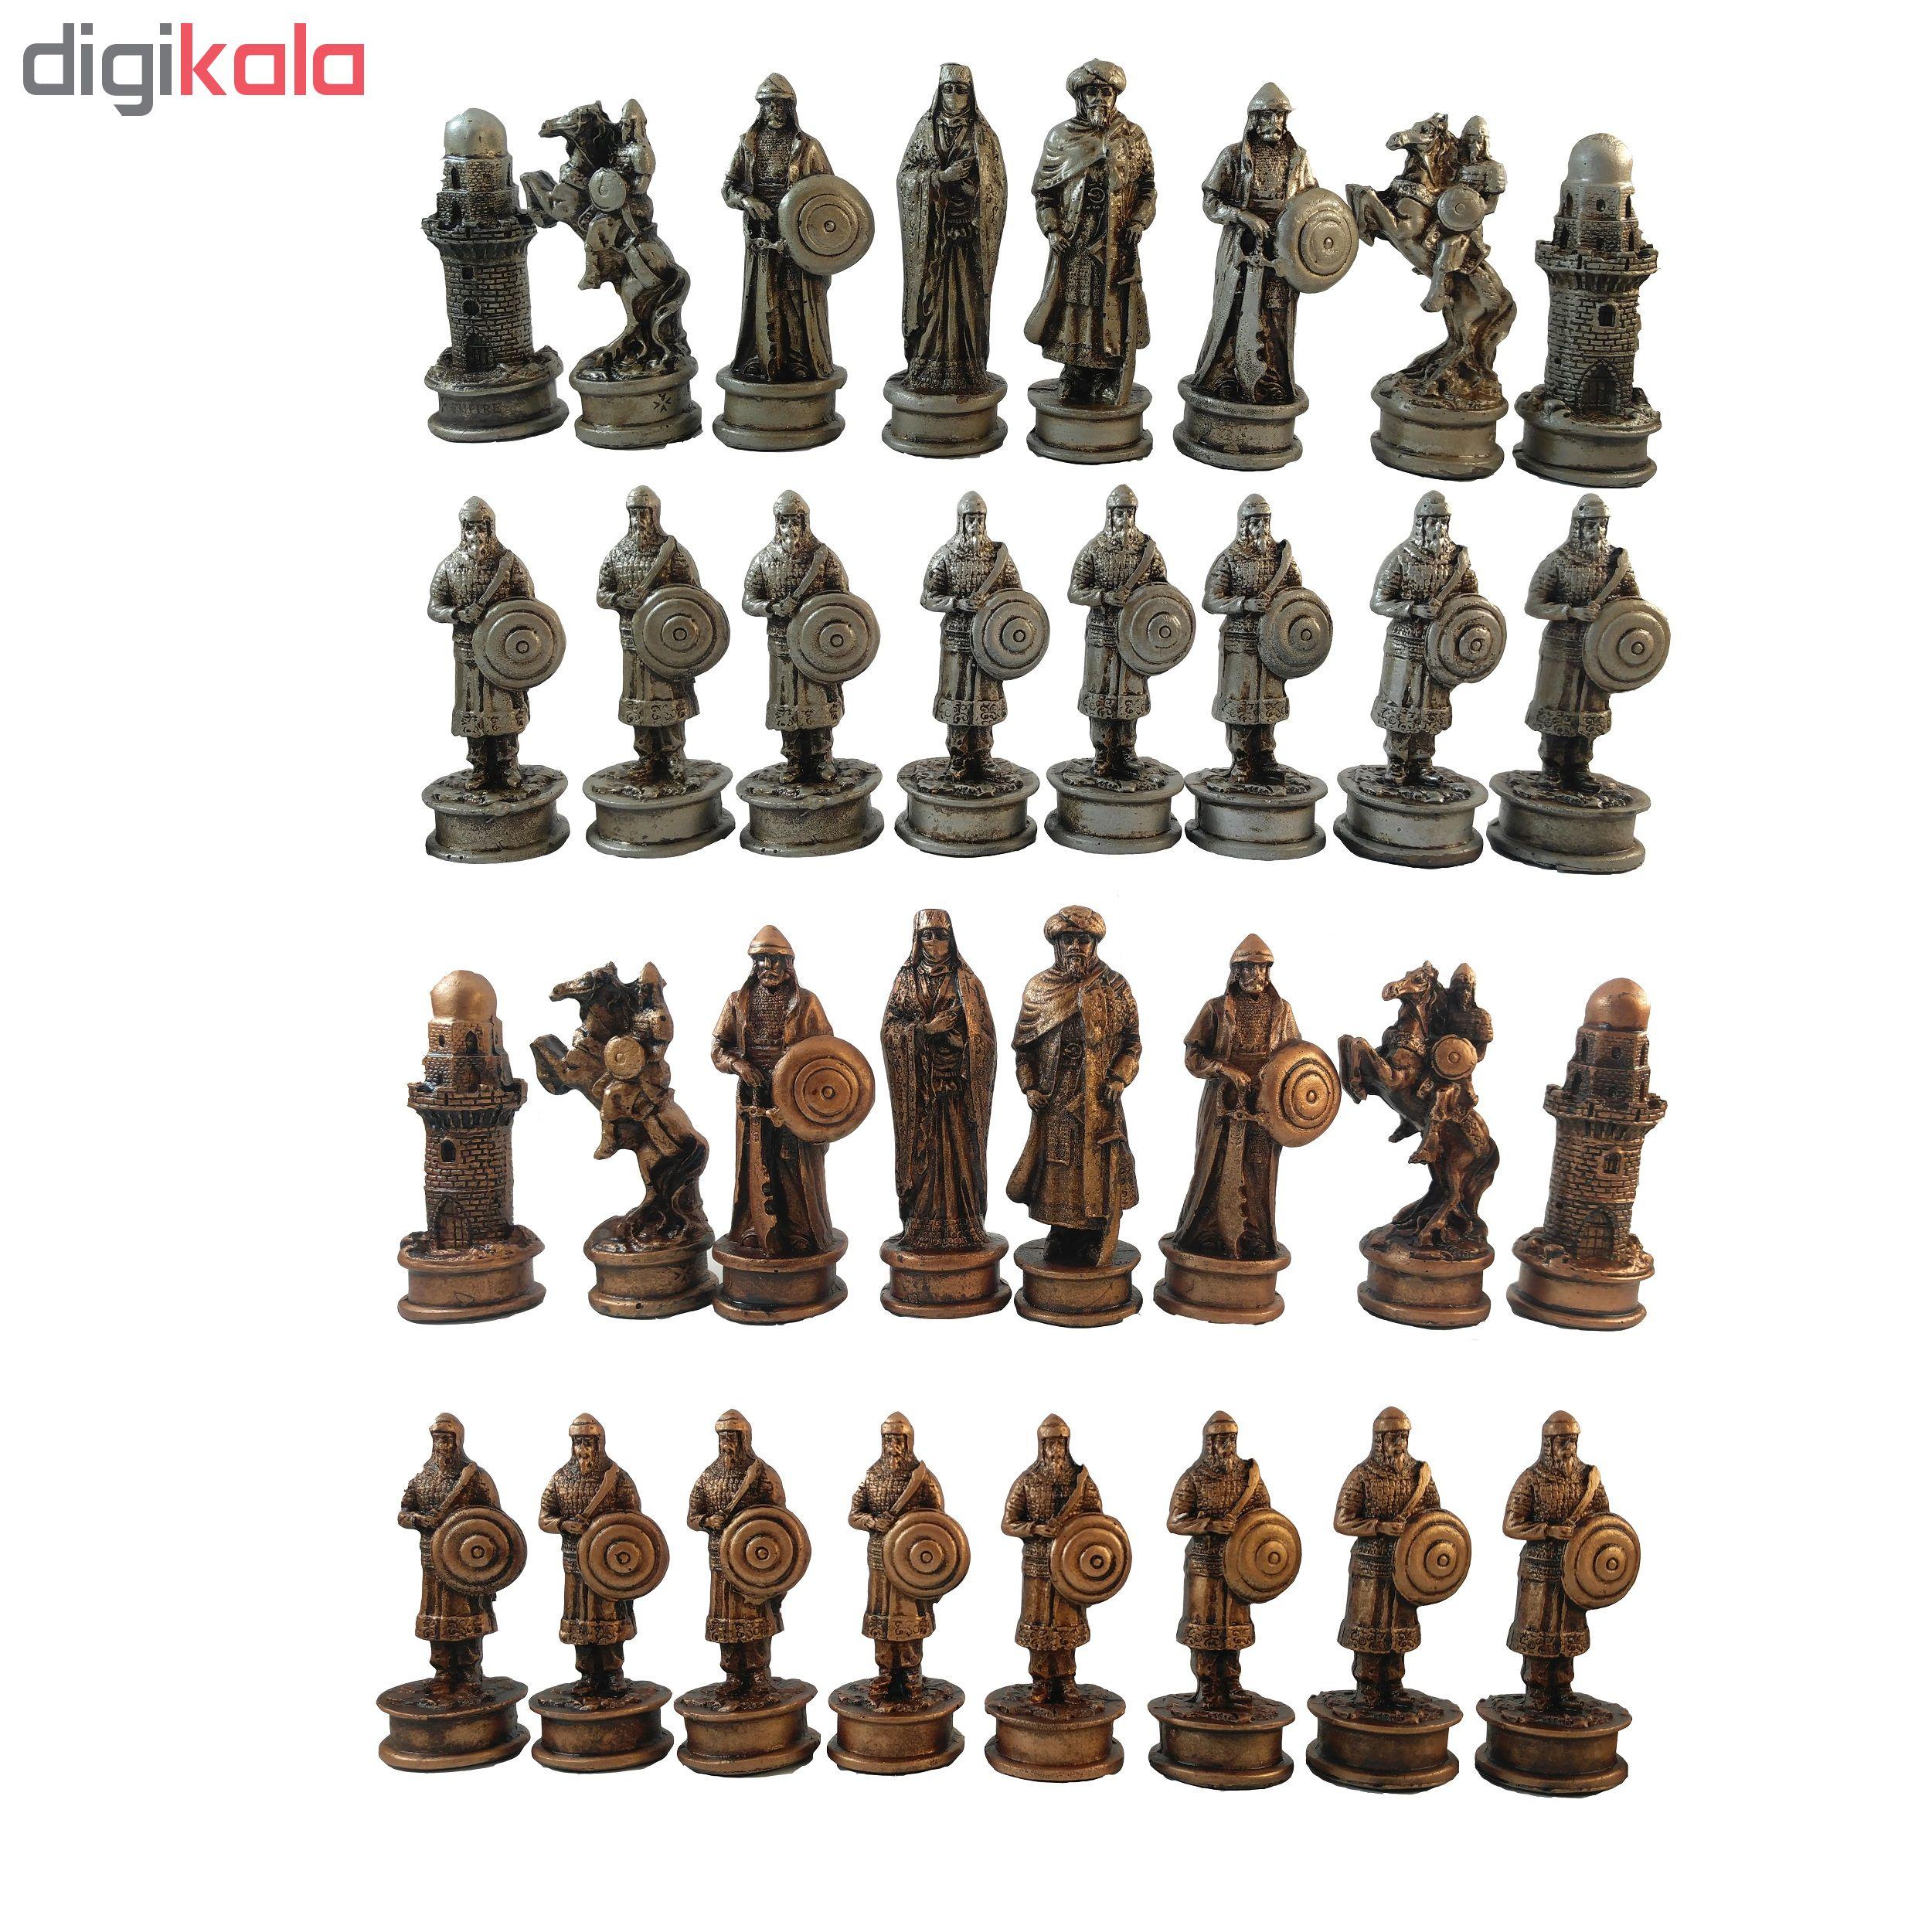 مهره شطرنج کد A4 مجموعه 32 عددی